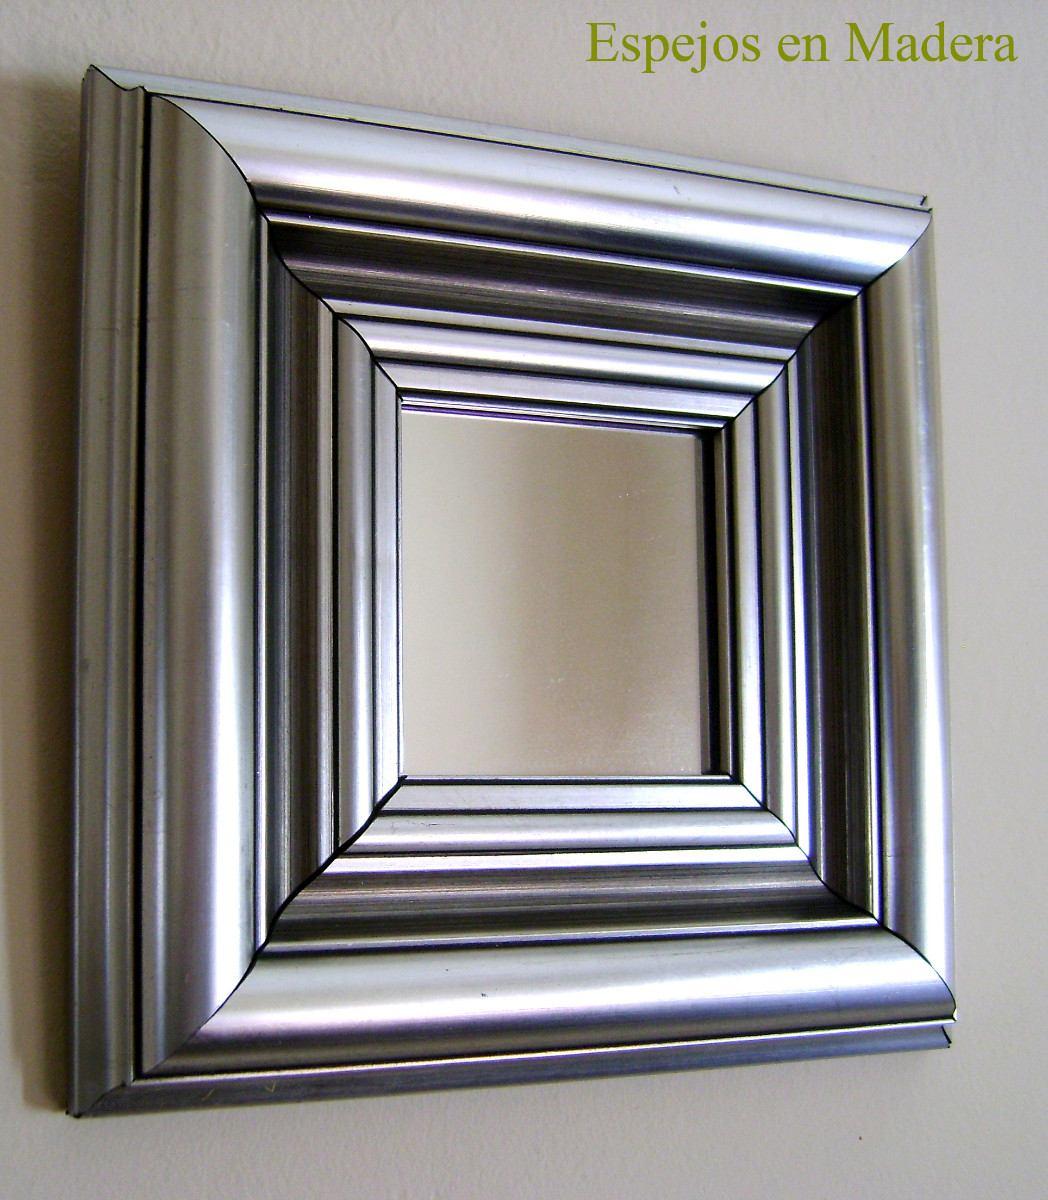 Espejo marco plateado espejo plata b and b with espejo for Espejos con marco plateado